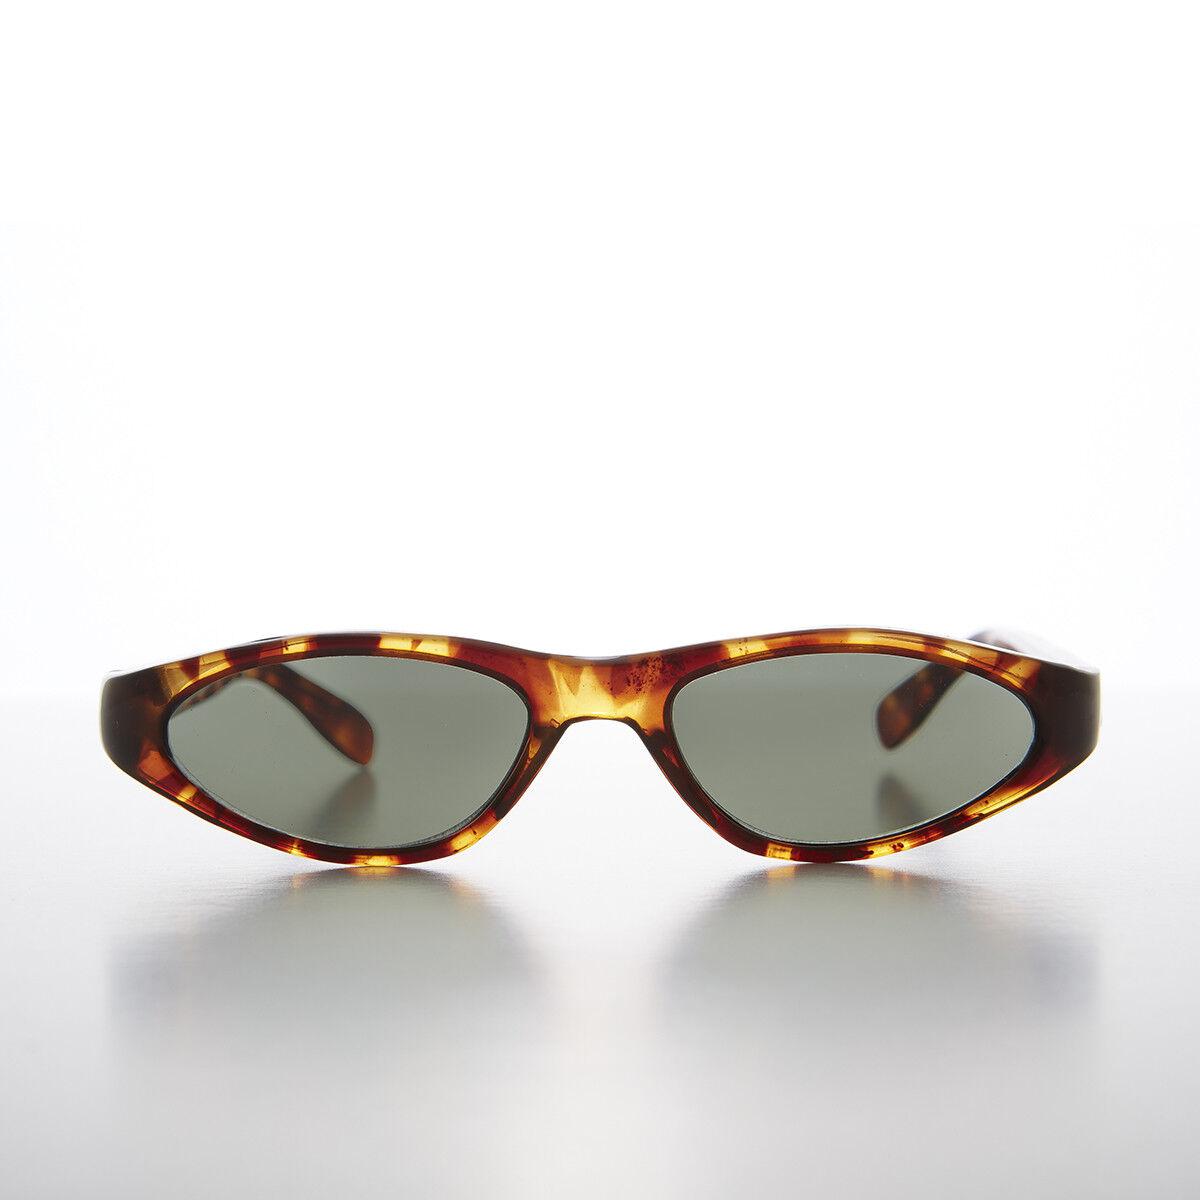 Gold Tortoiseshell Small Cat Eye 90s Vintage Sunglass Green Lens - Vicky